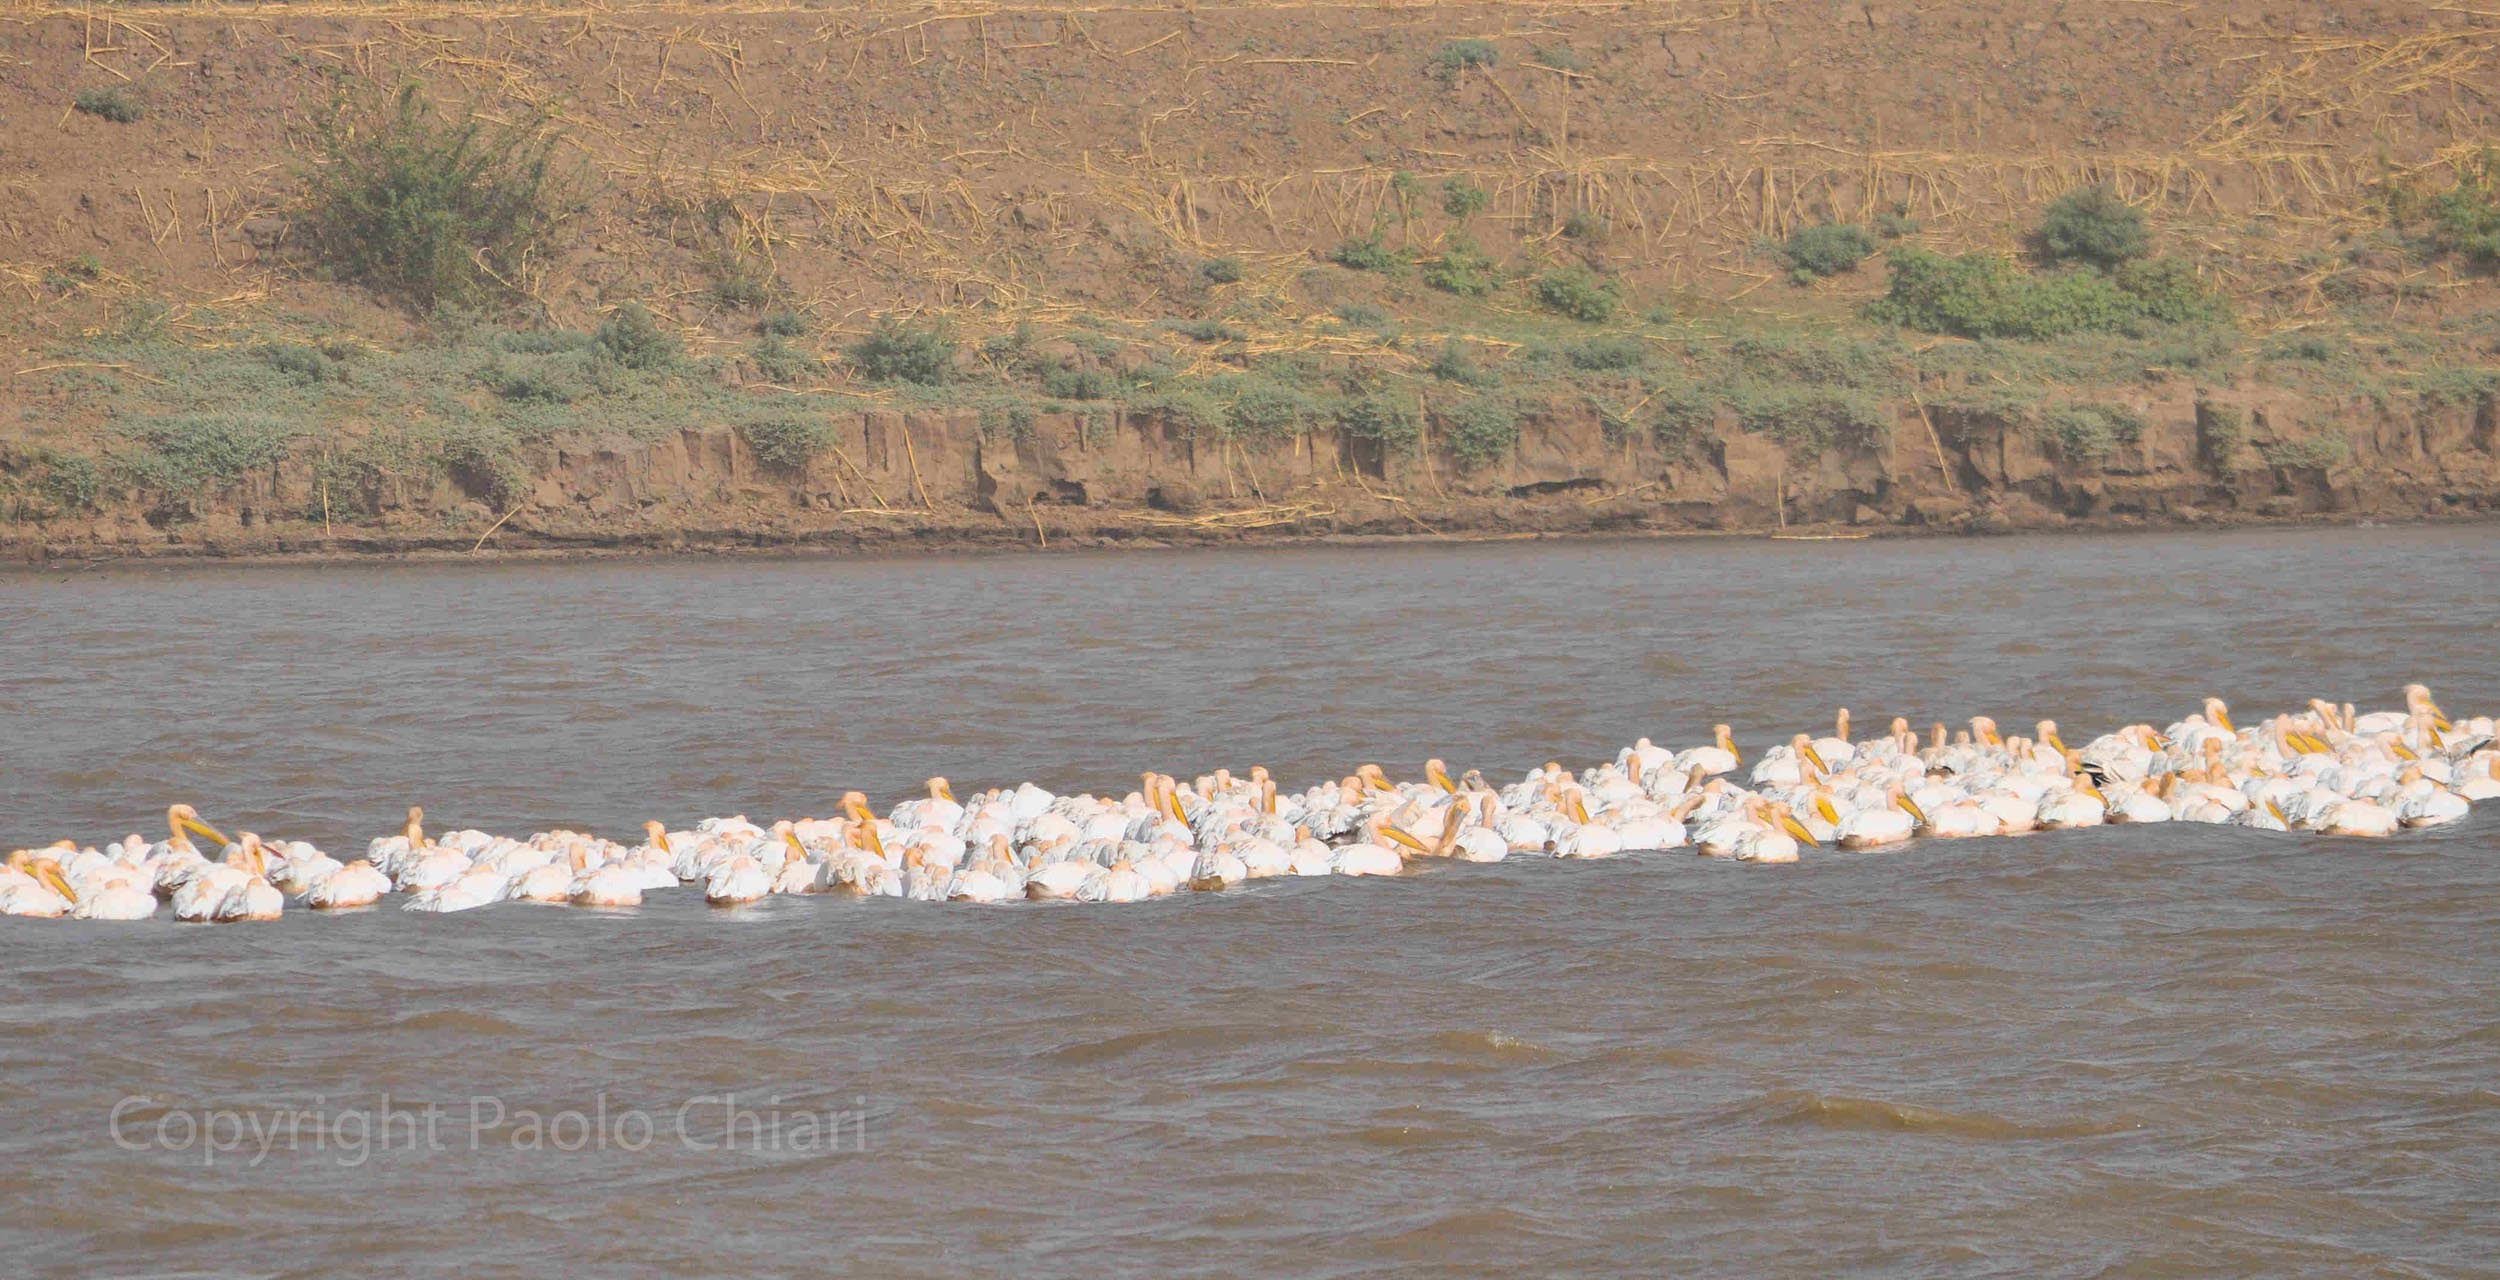 Sudan2013_0246